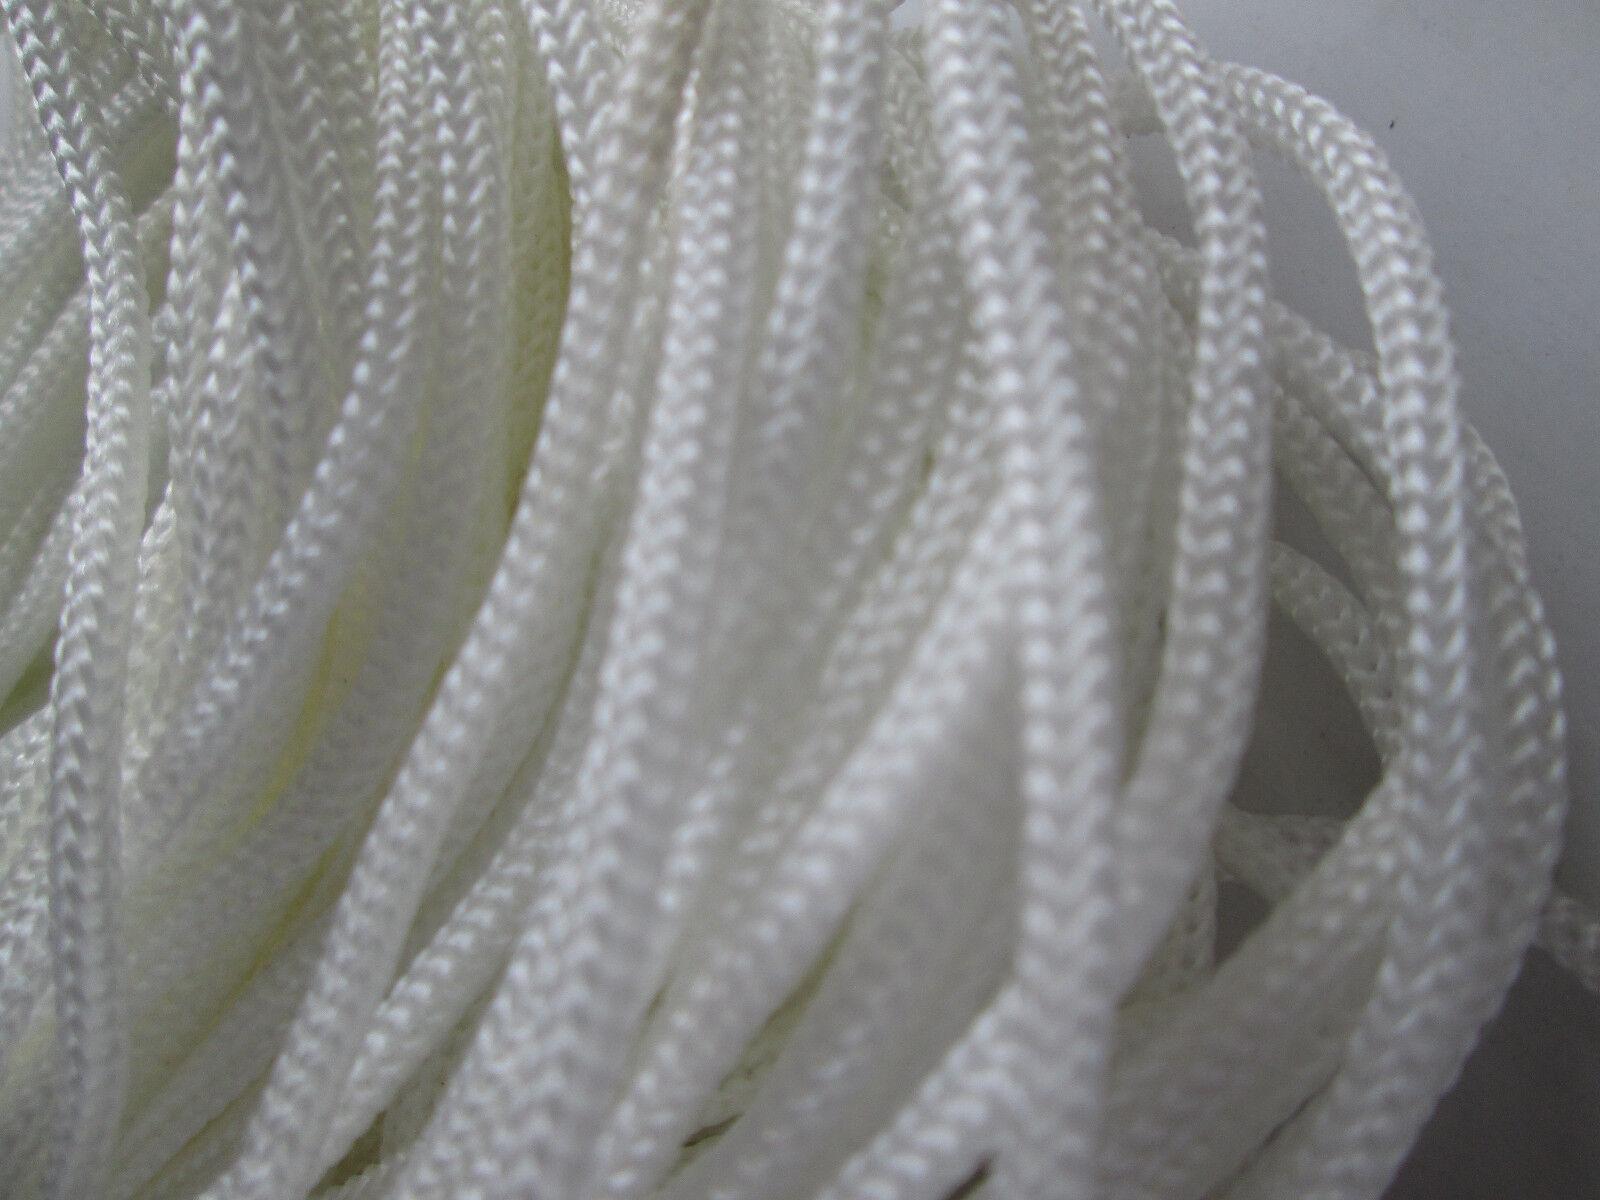 10 METER kordel Satin Weiß 3mm elegante Borte Spitze KR 001